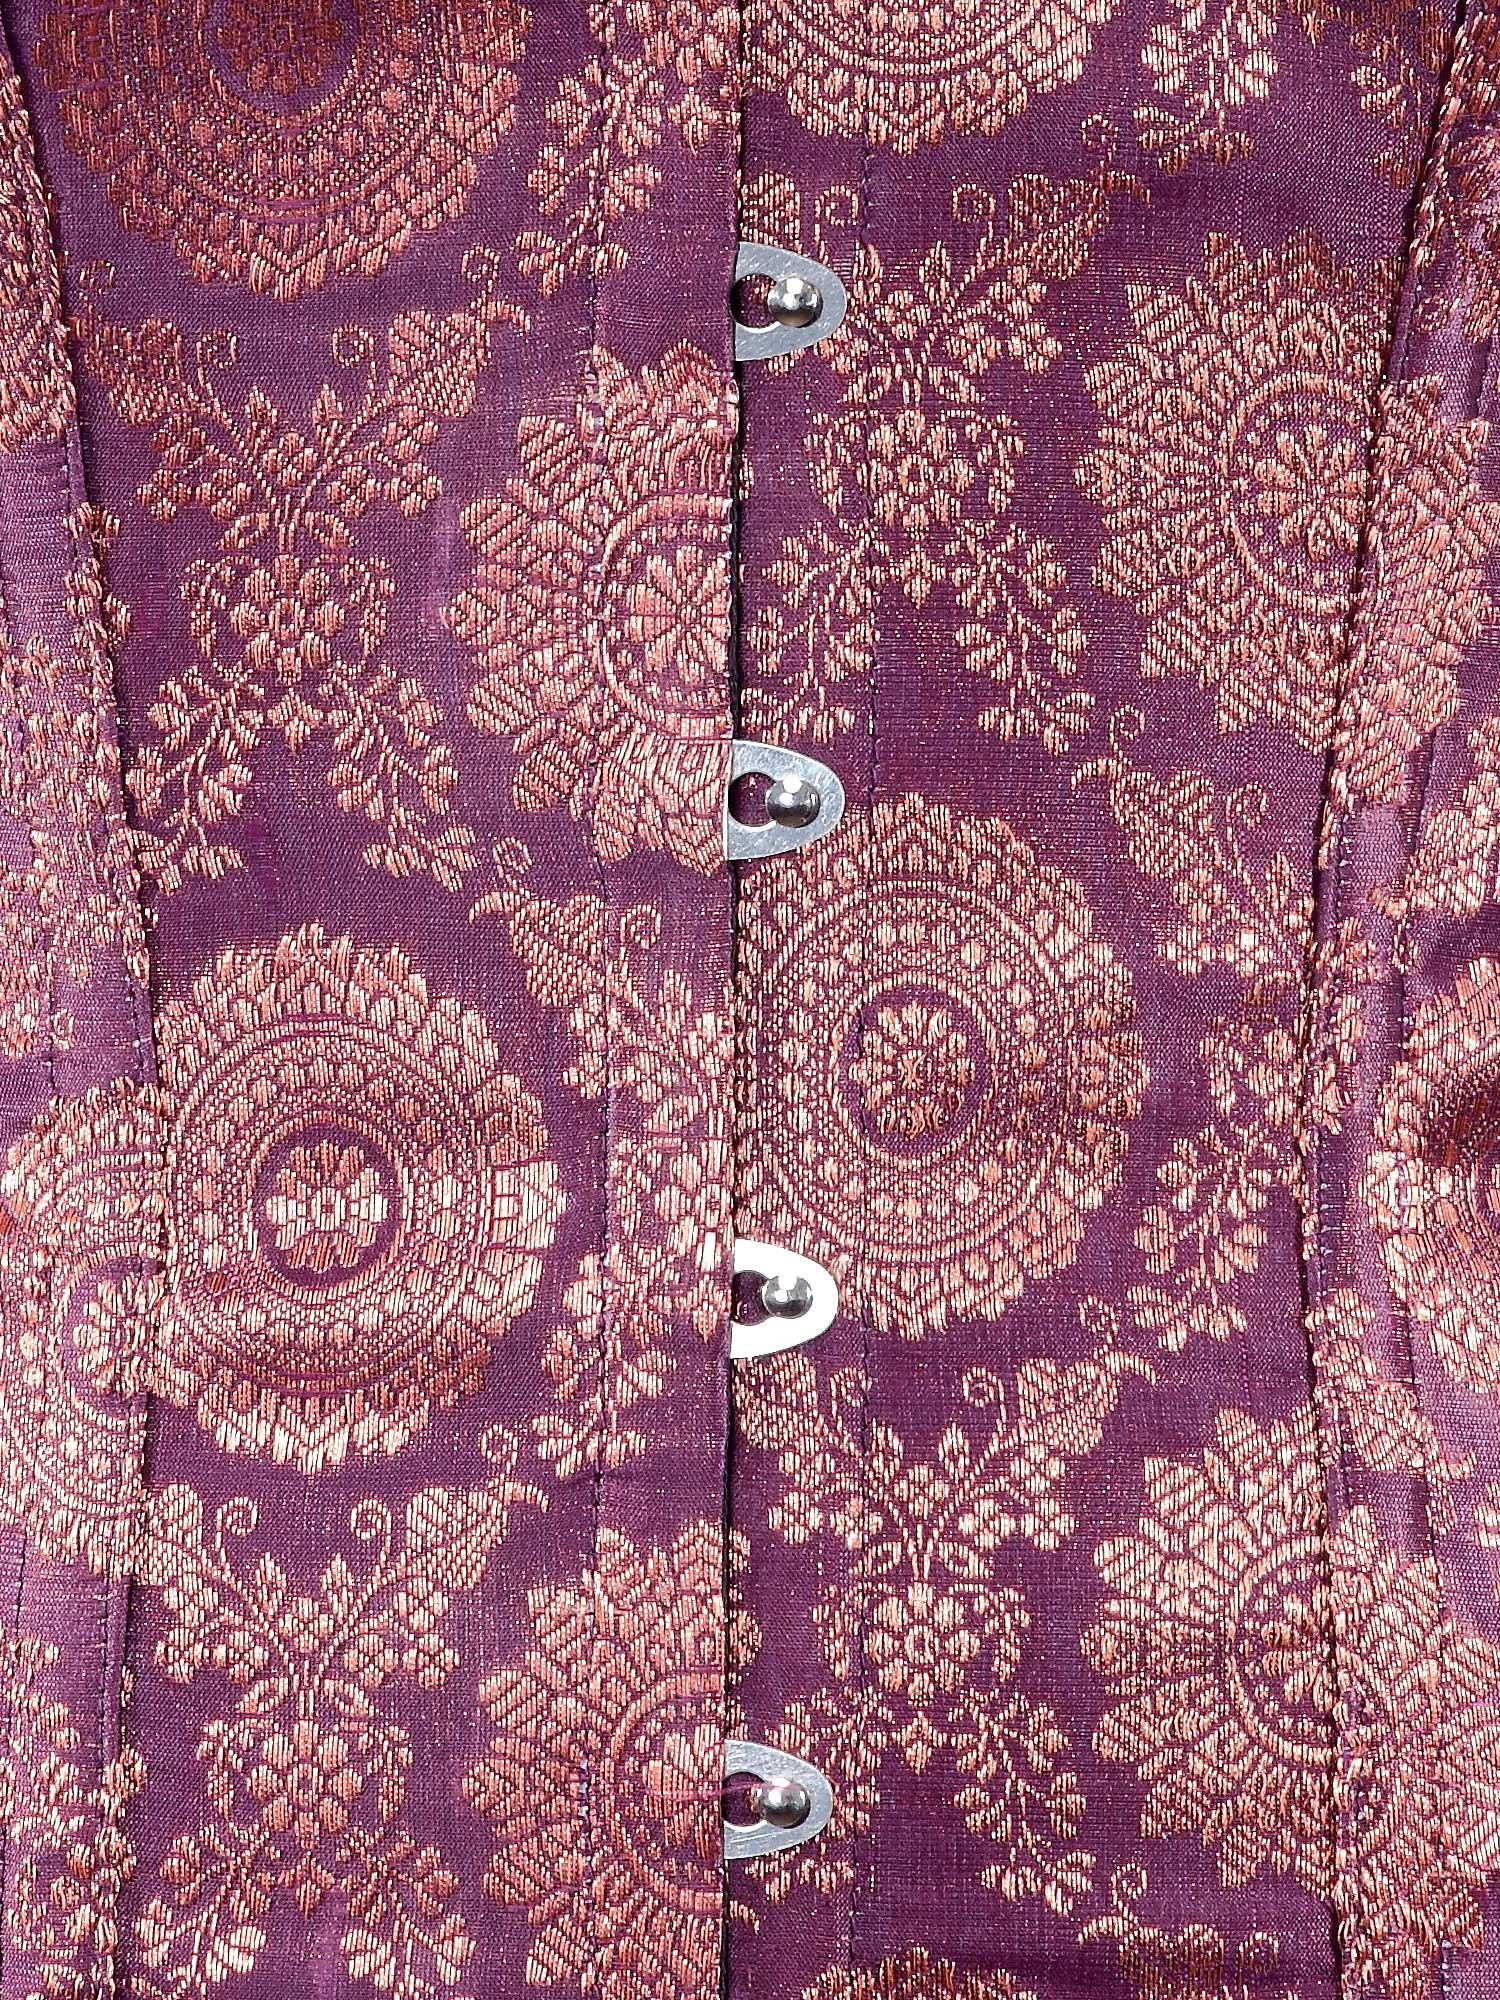 purple_ethnic_indian_fabric_steel_boning_corset_waist_cincher_bustier_bustiers_and_corsets_2.jpg